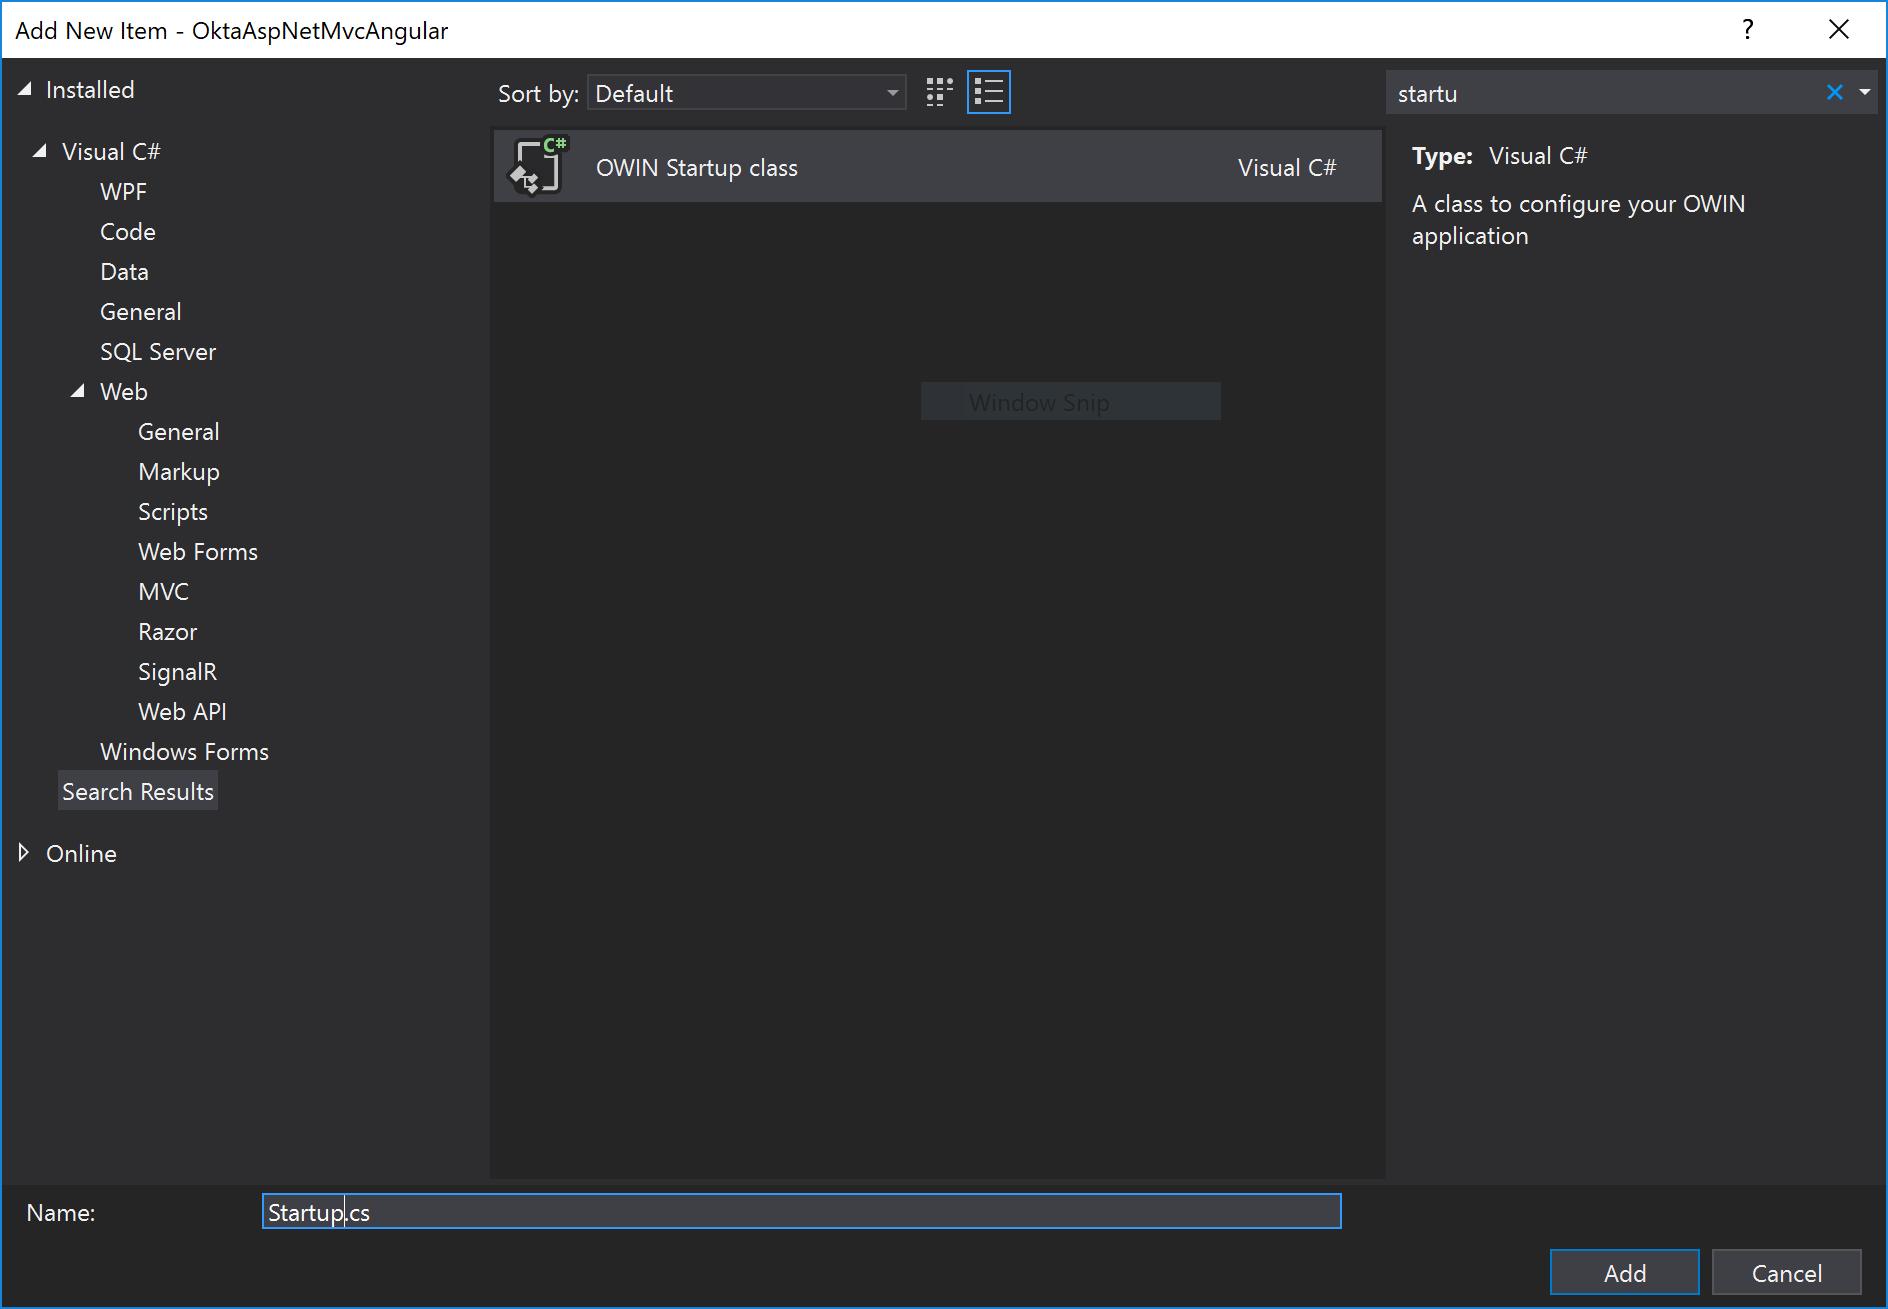 Build a Basic Website with ASP NET MVC and Angular | Okta